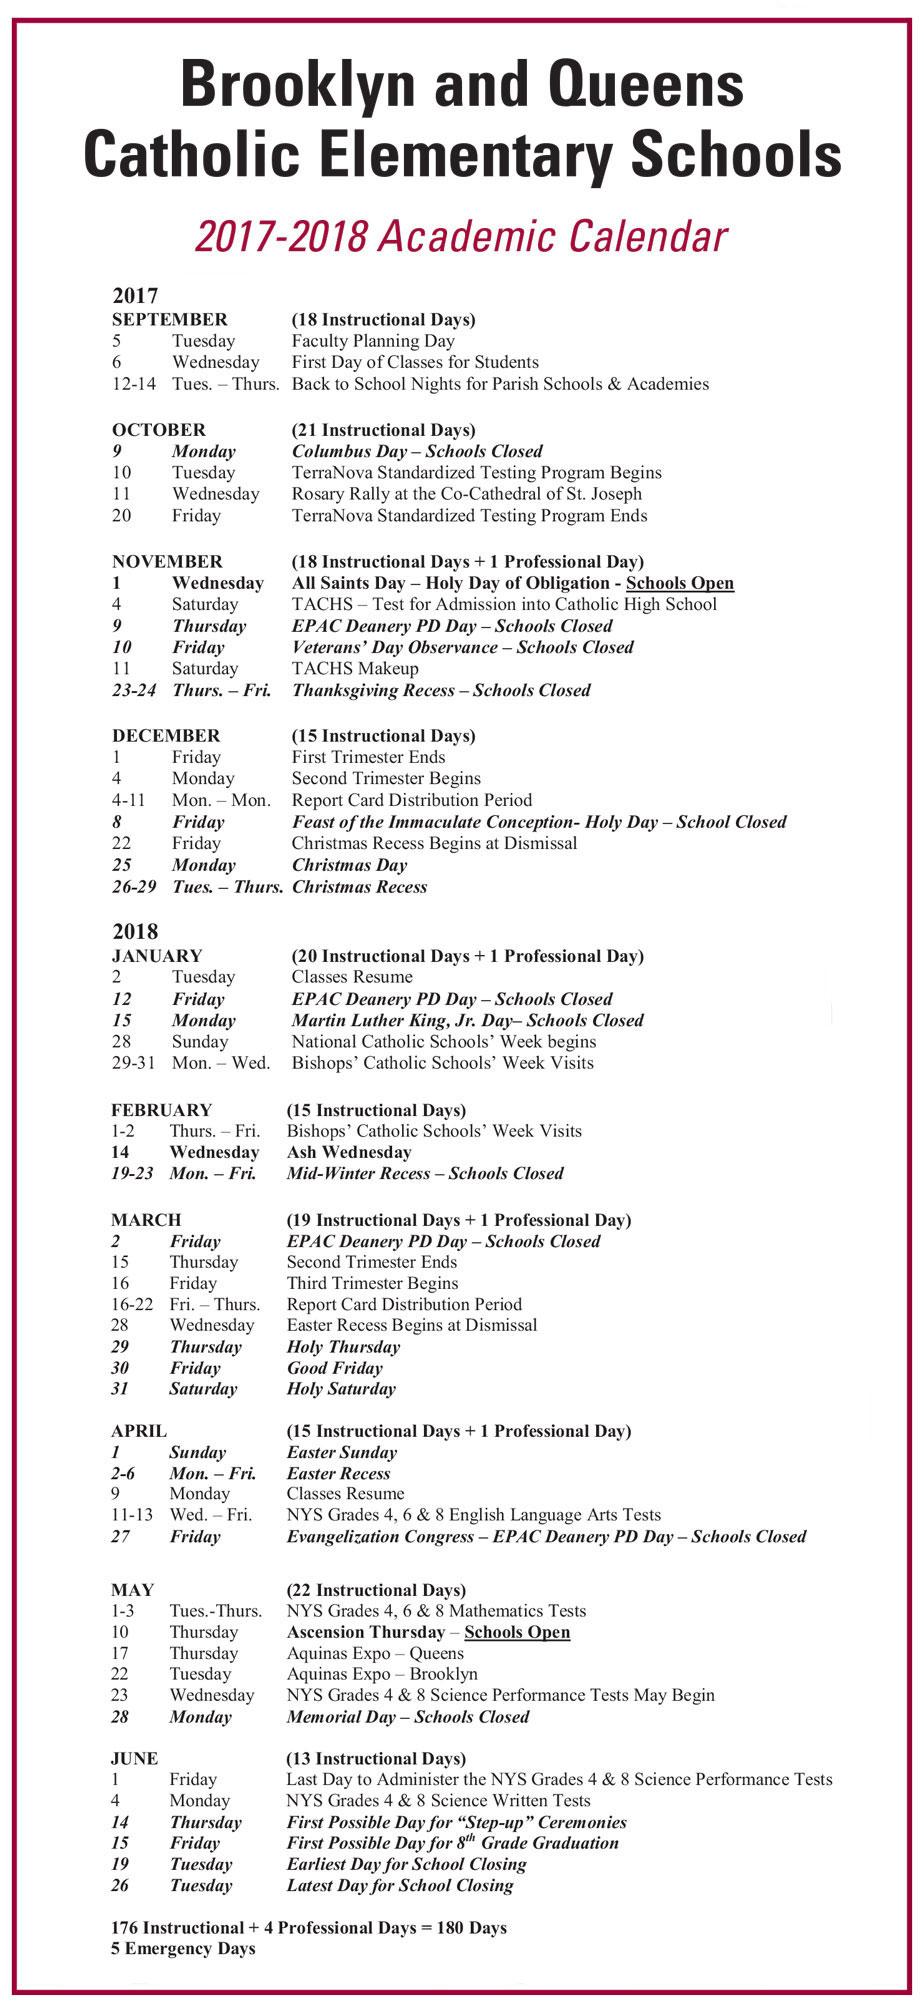 Brooklyn College Calendar Spring 2022.Brooklyn And Queens Academic Calendar 2017 18 The Tablet